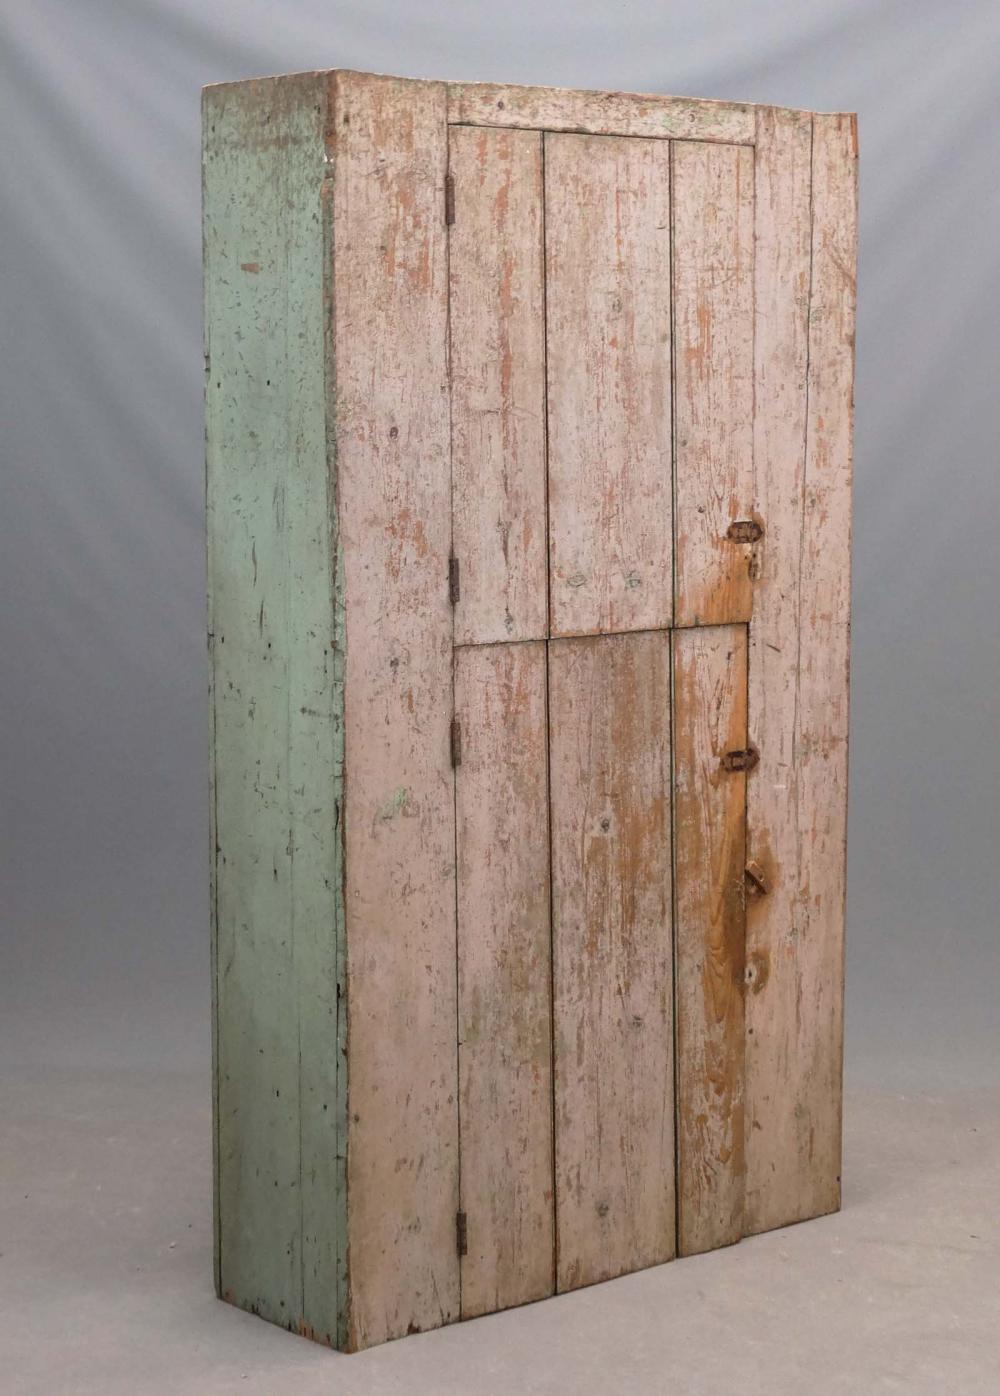 19th c. Wall Cupboard